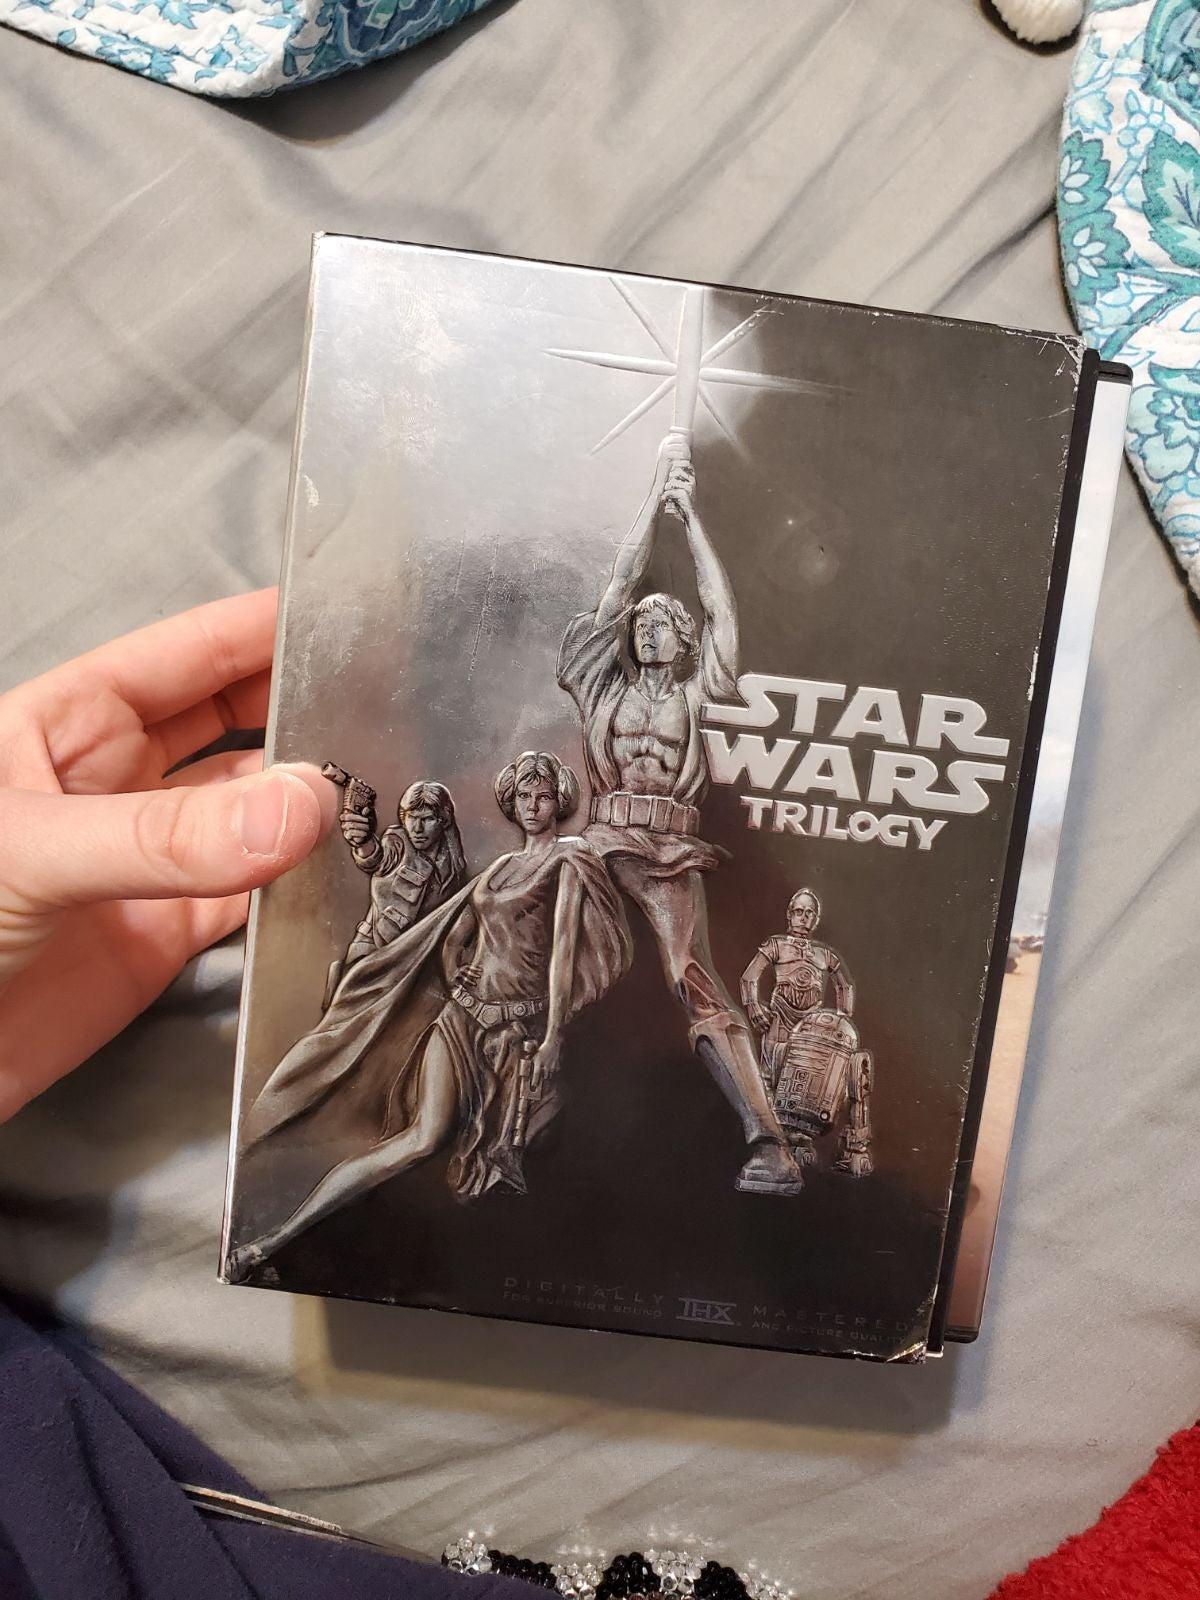 Star Wars Trilogy DVD set